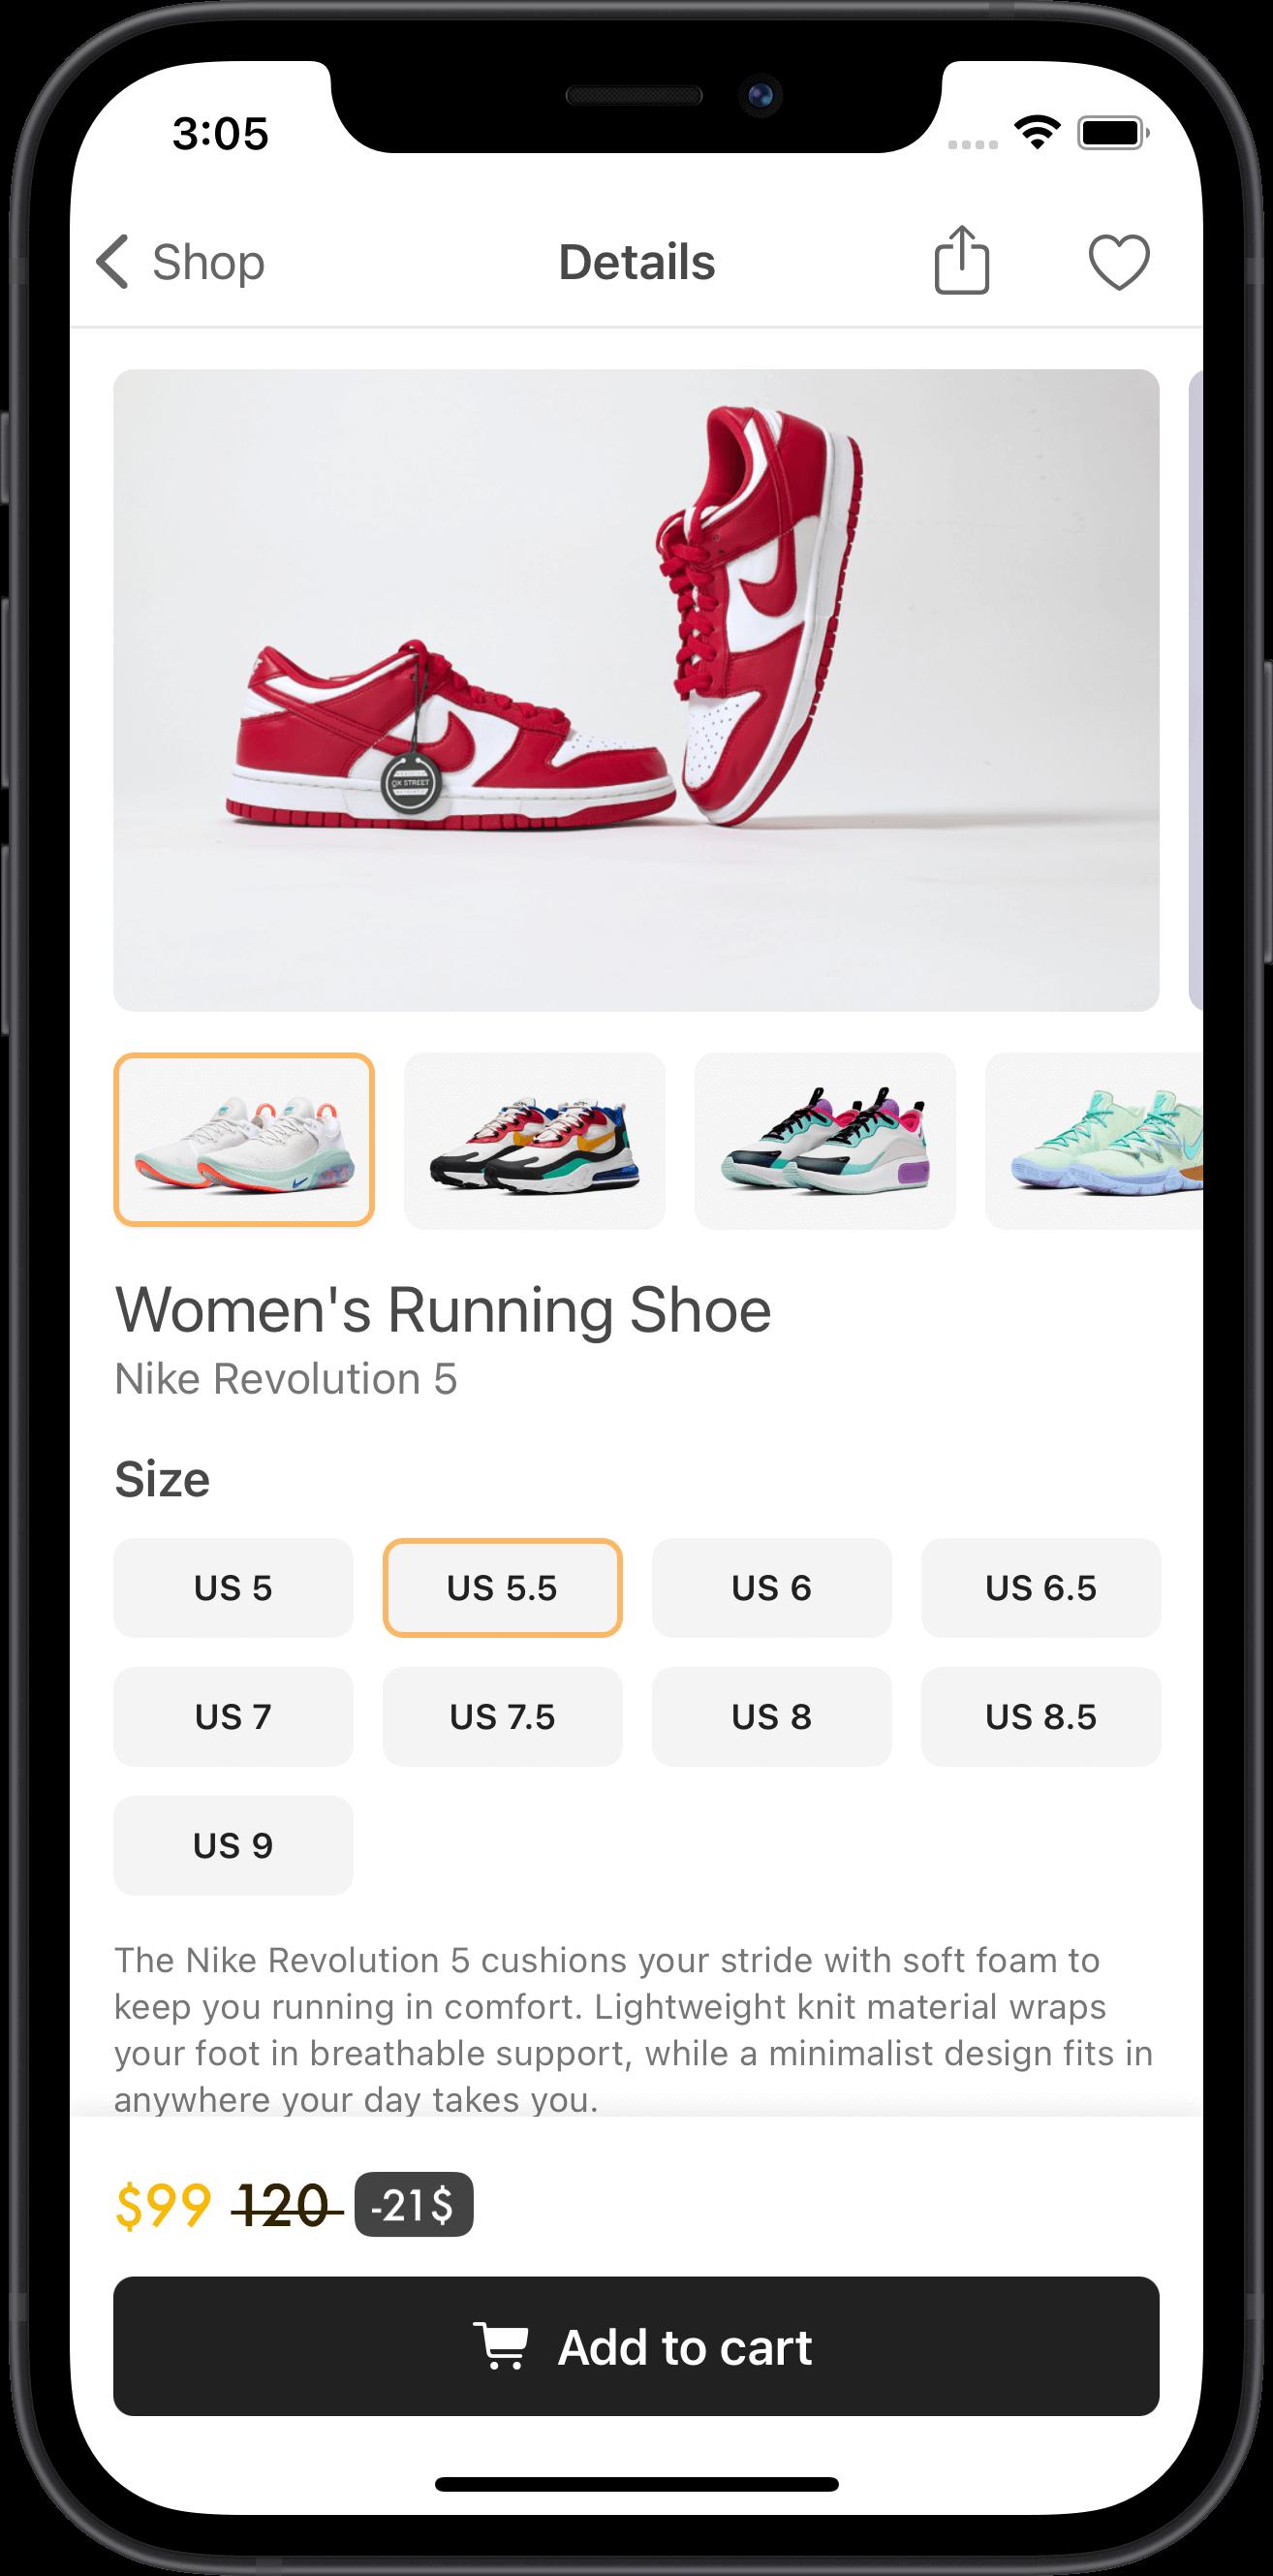 e-commerce, men, sneakers, nike, women